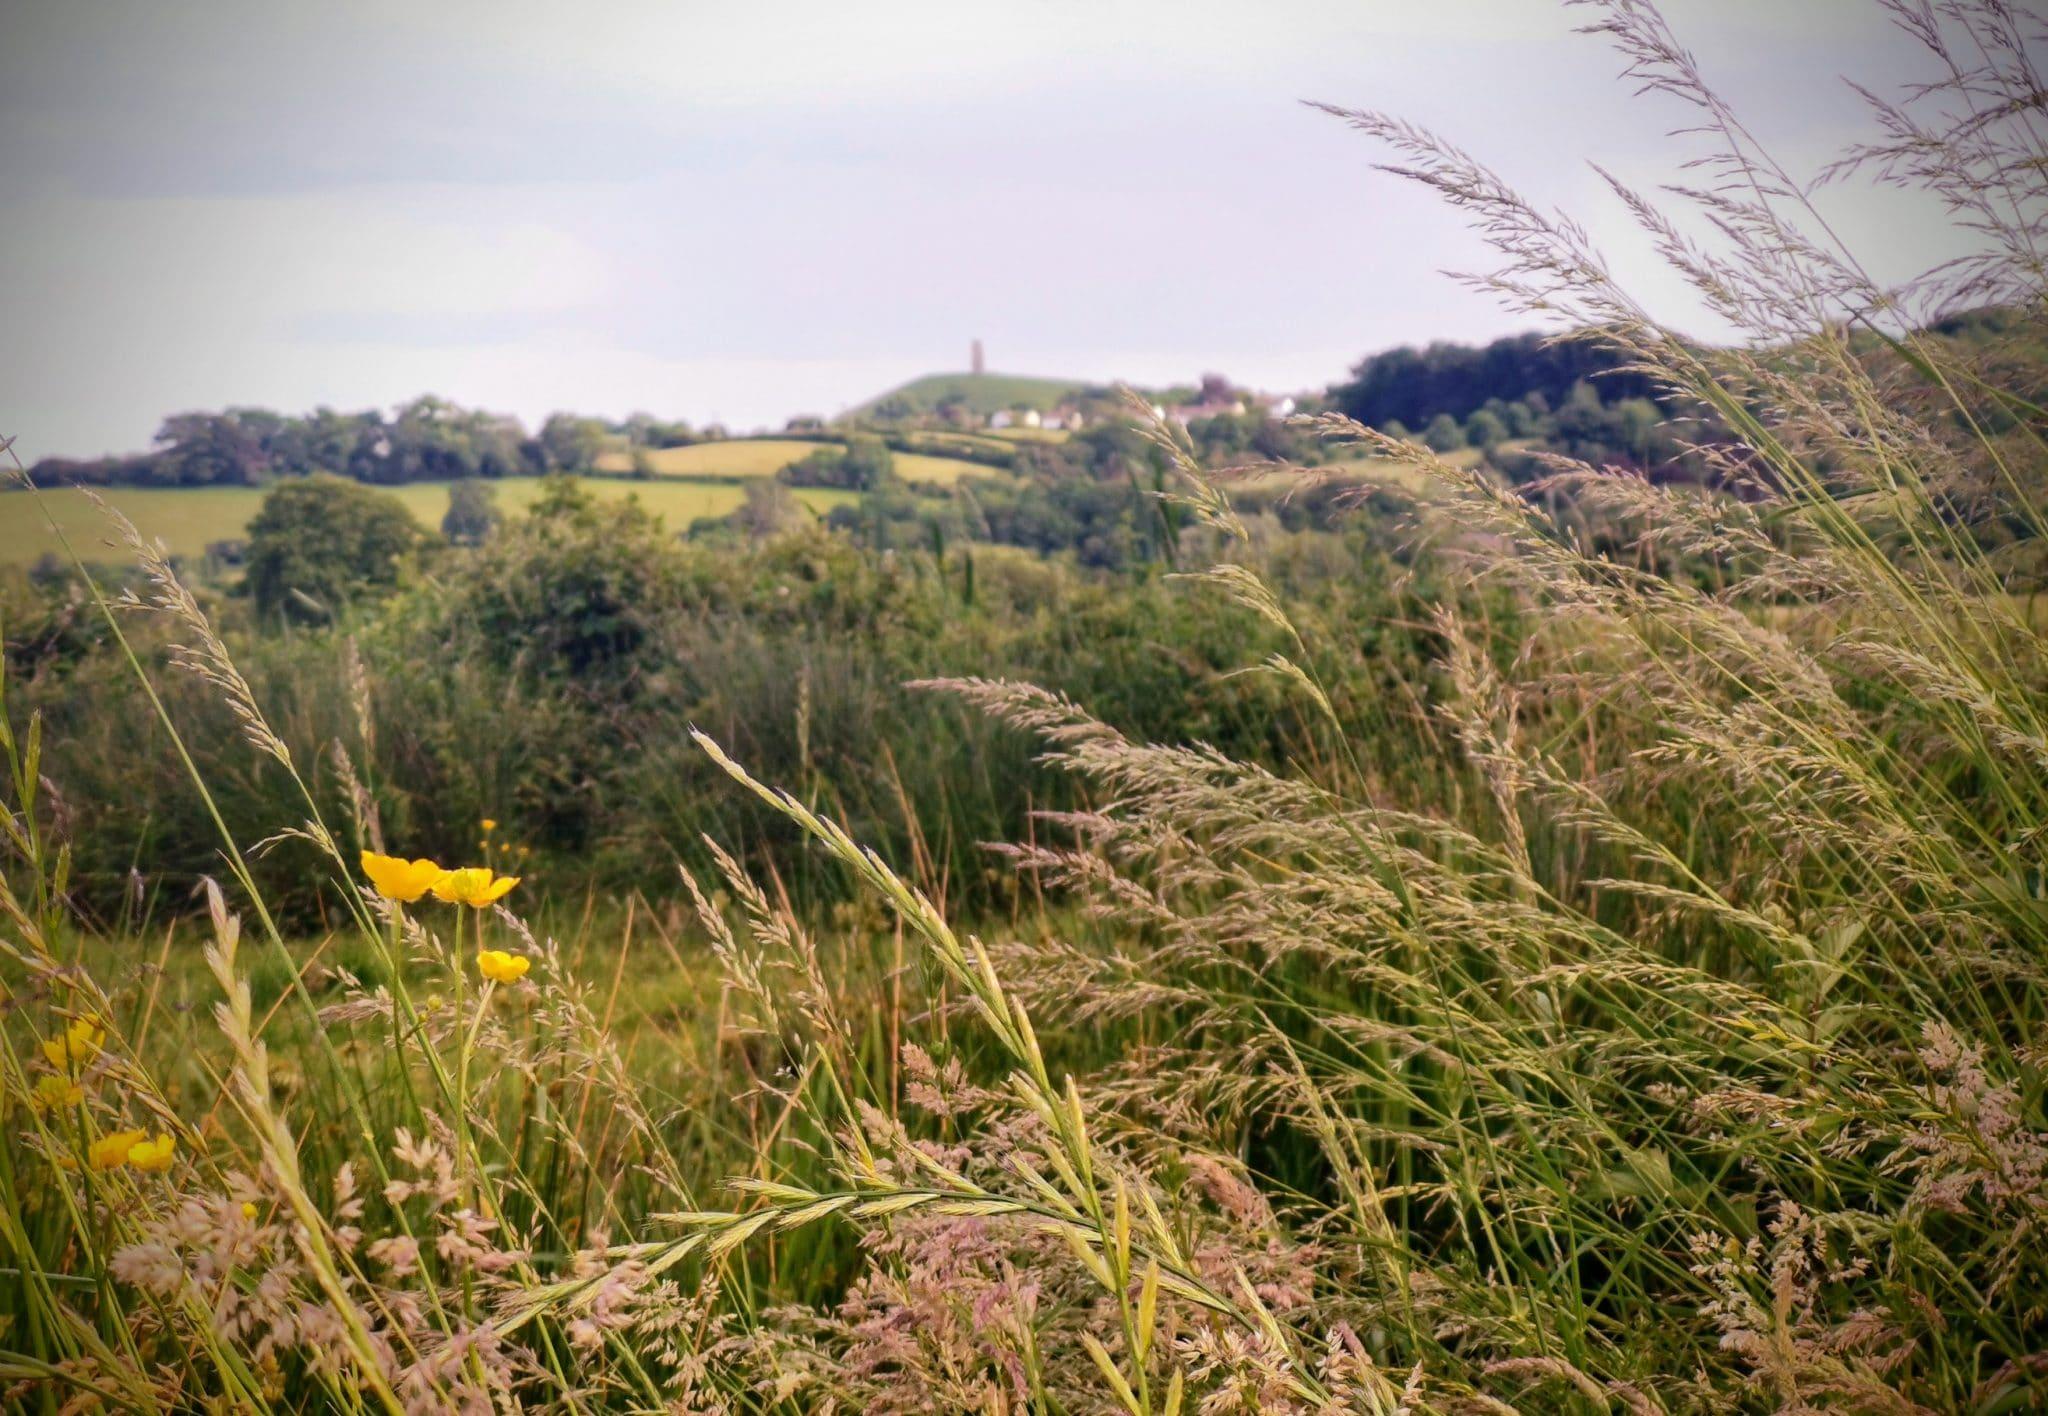 Glastobury Tor from the Levels Summer 2021